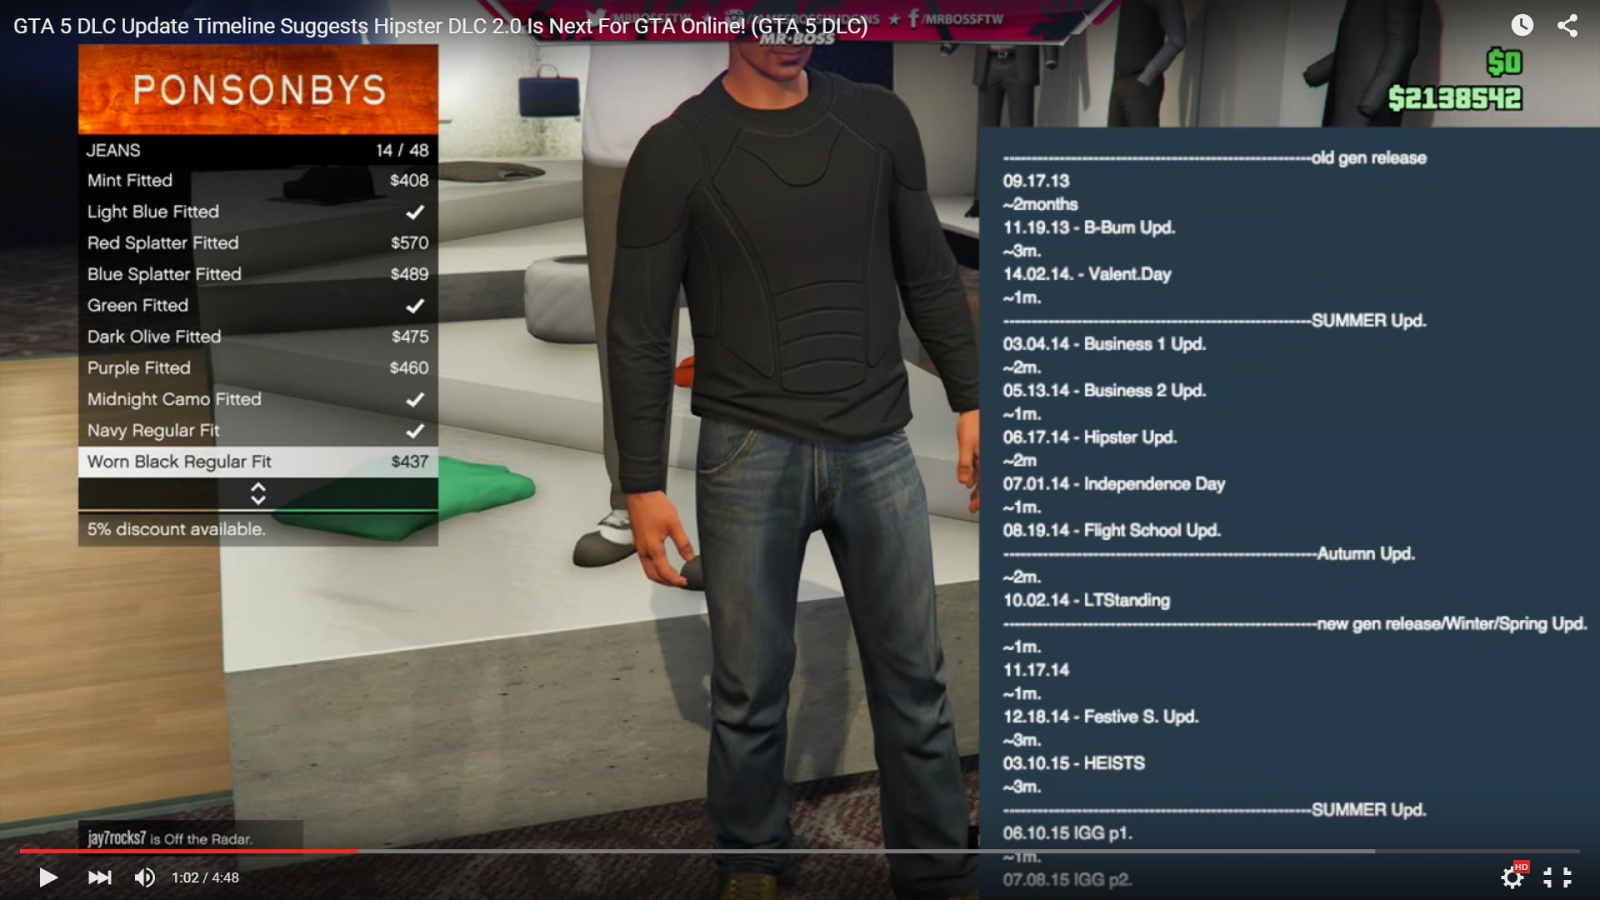 GTA 5 DLC release timeline